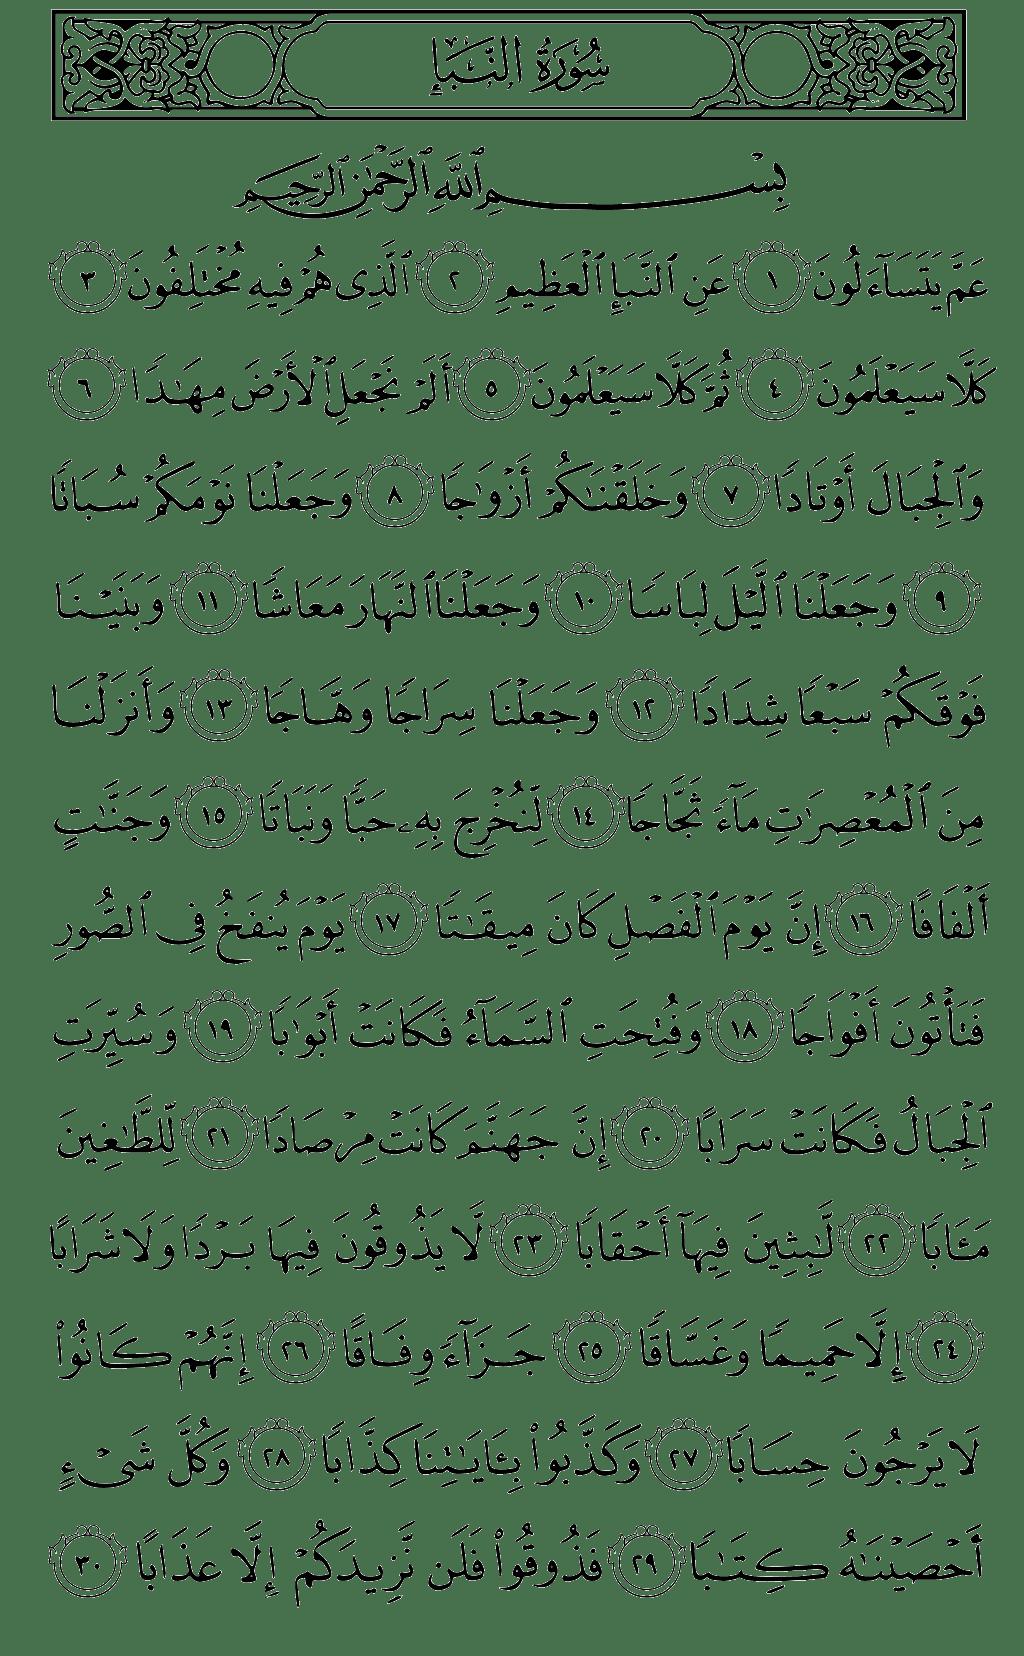 Surat Ar Rahman Ayat 1 78 Kumpulan Surat Penting